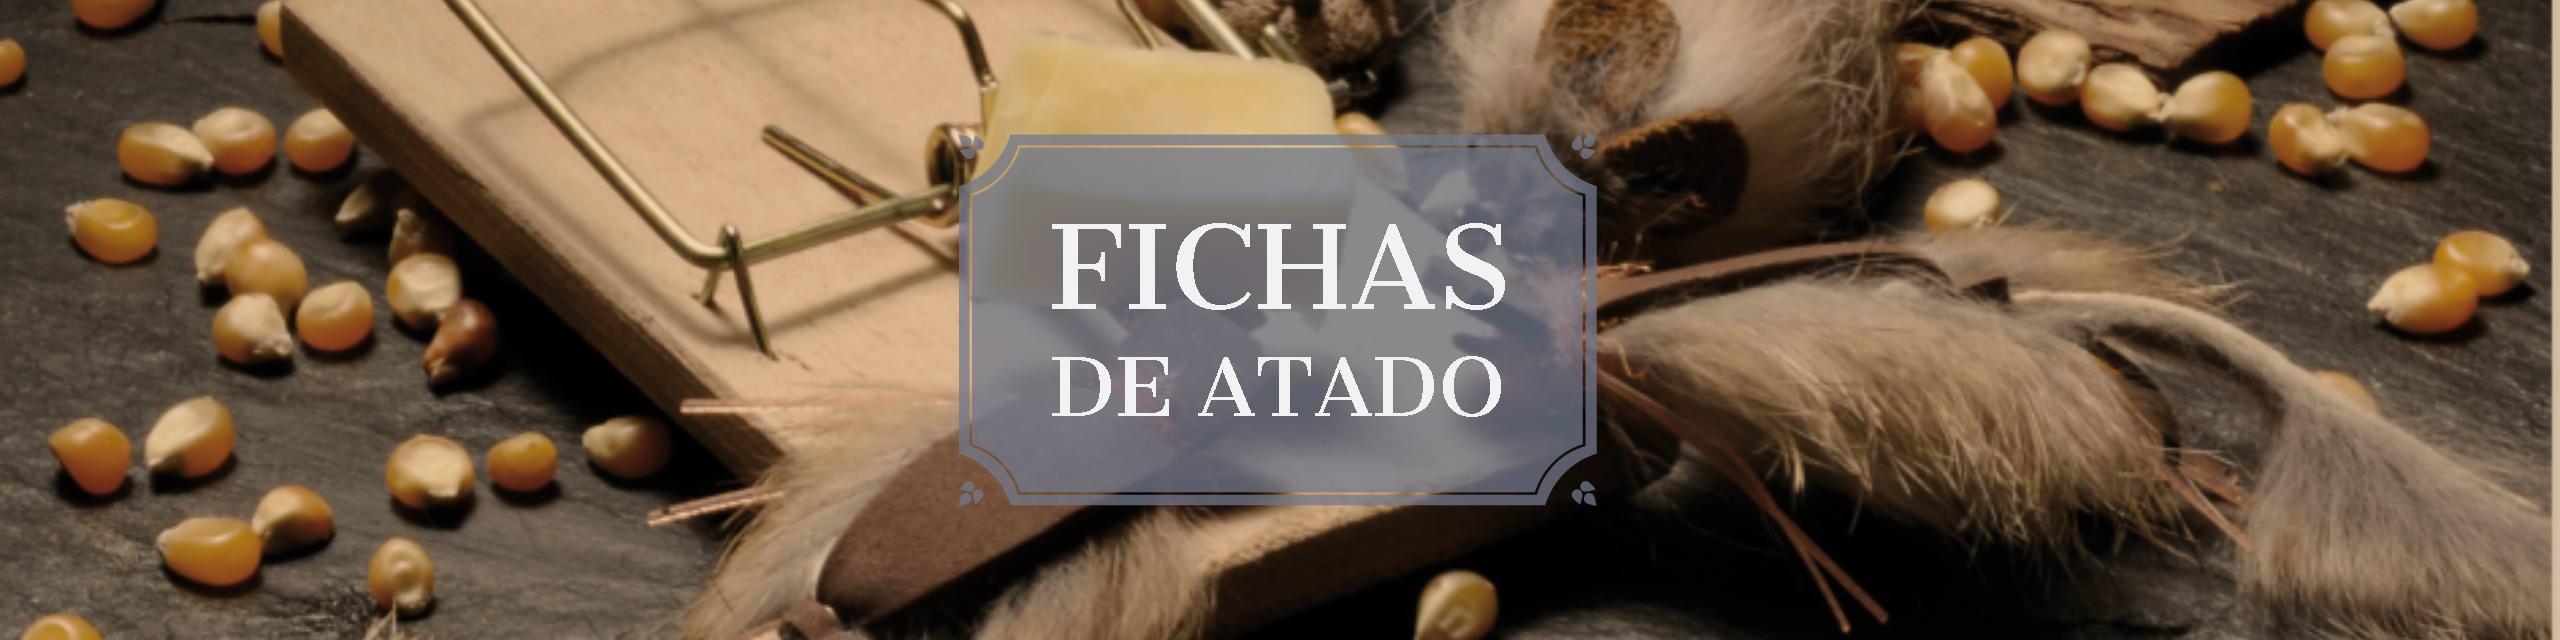 Fichas de Atado